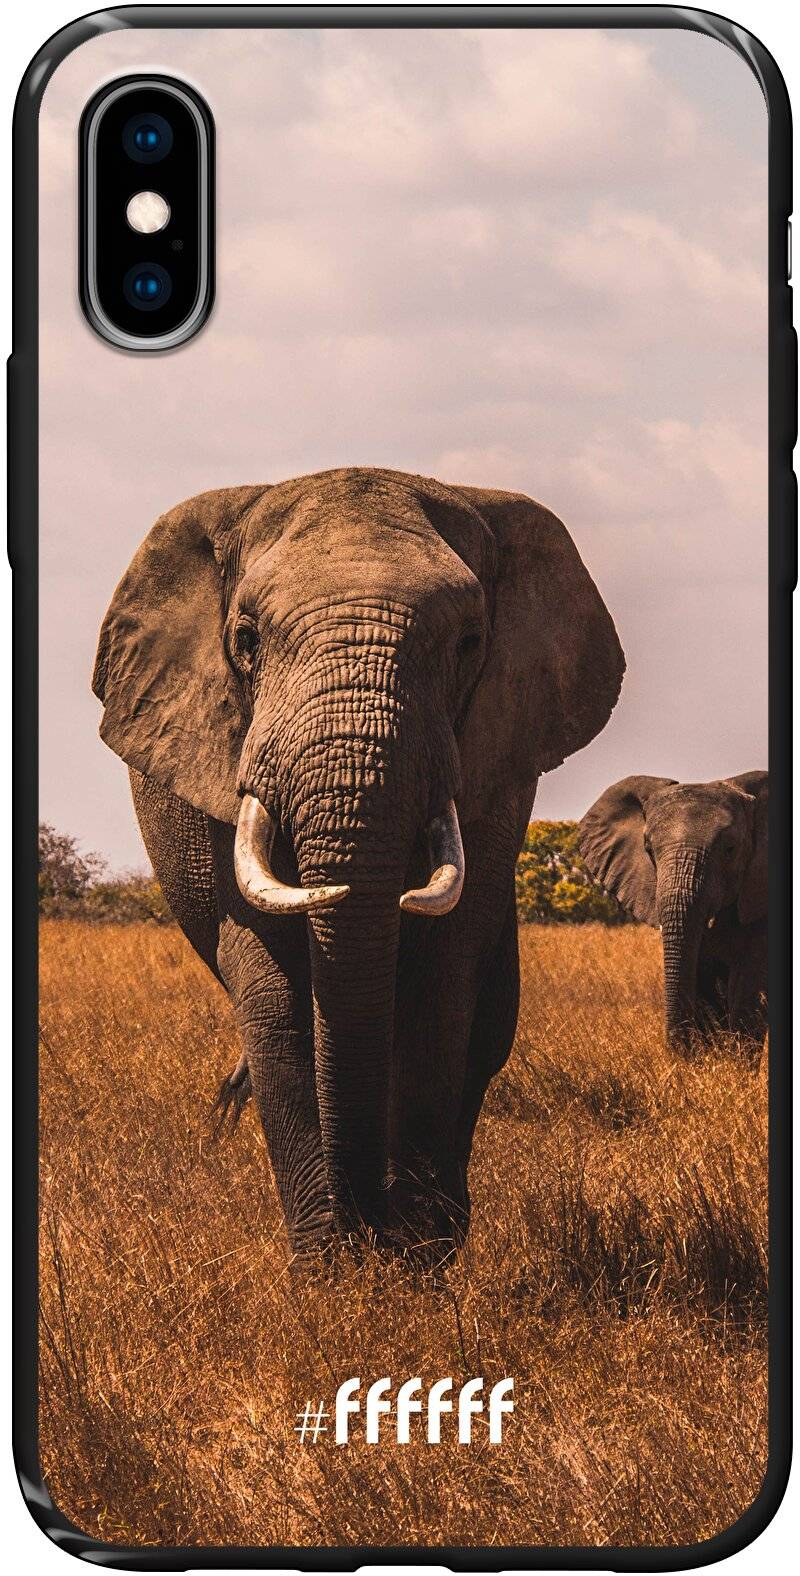 Elephants iPhone X